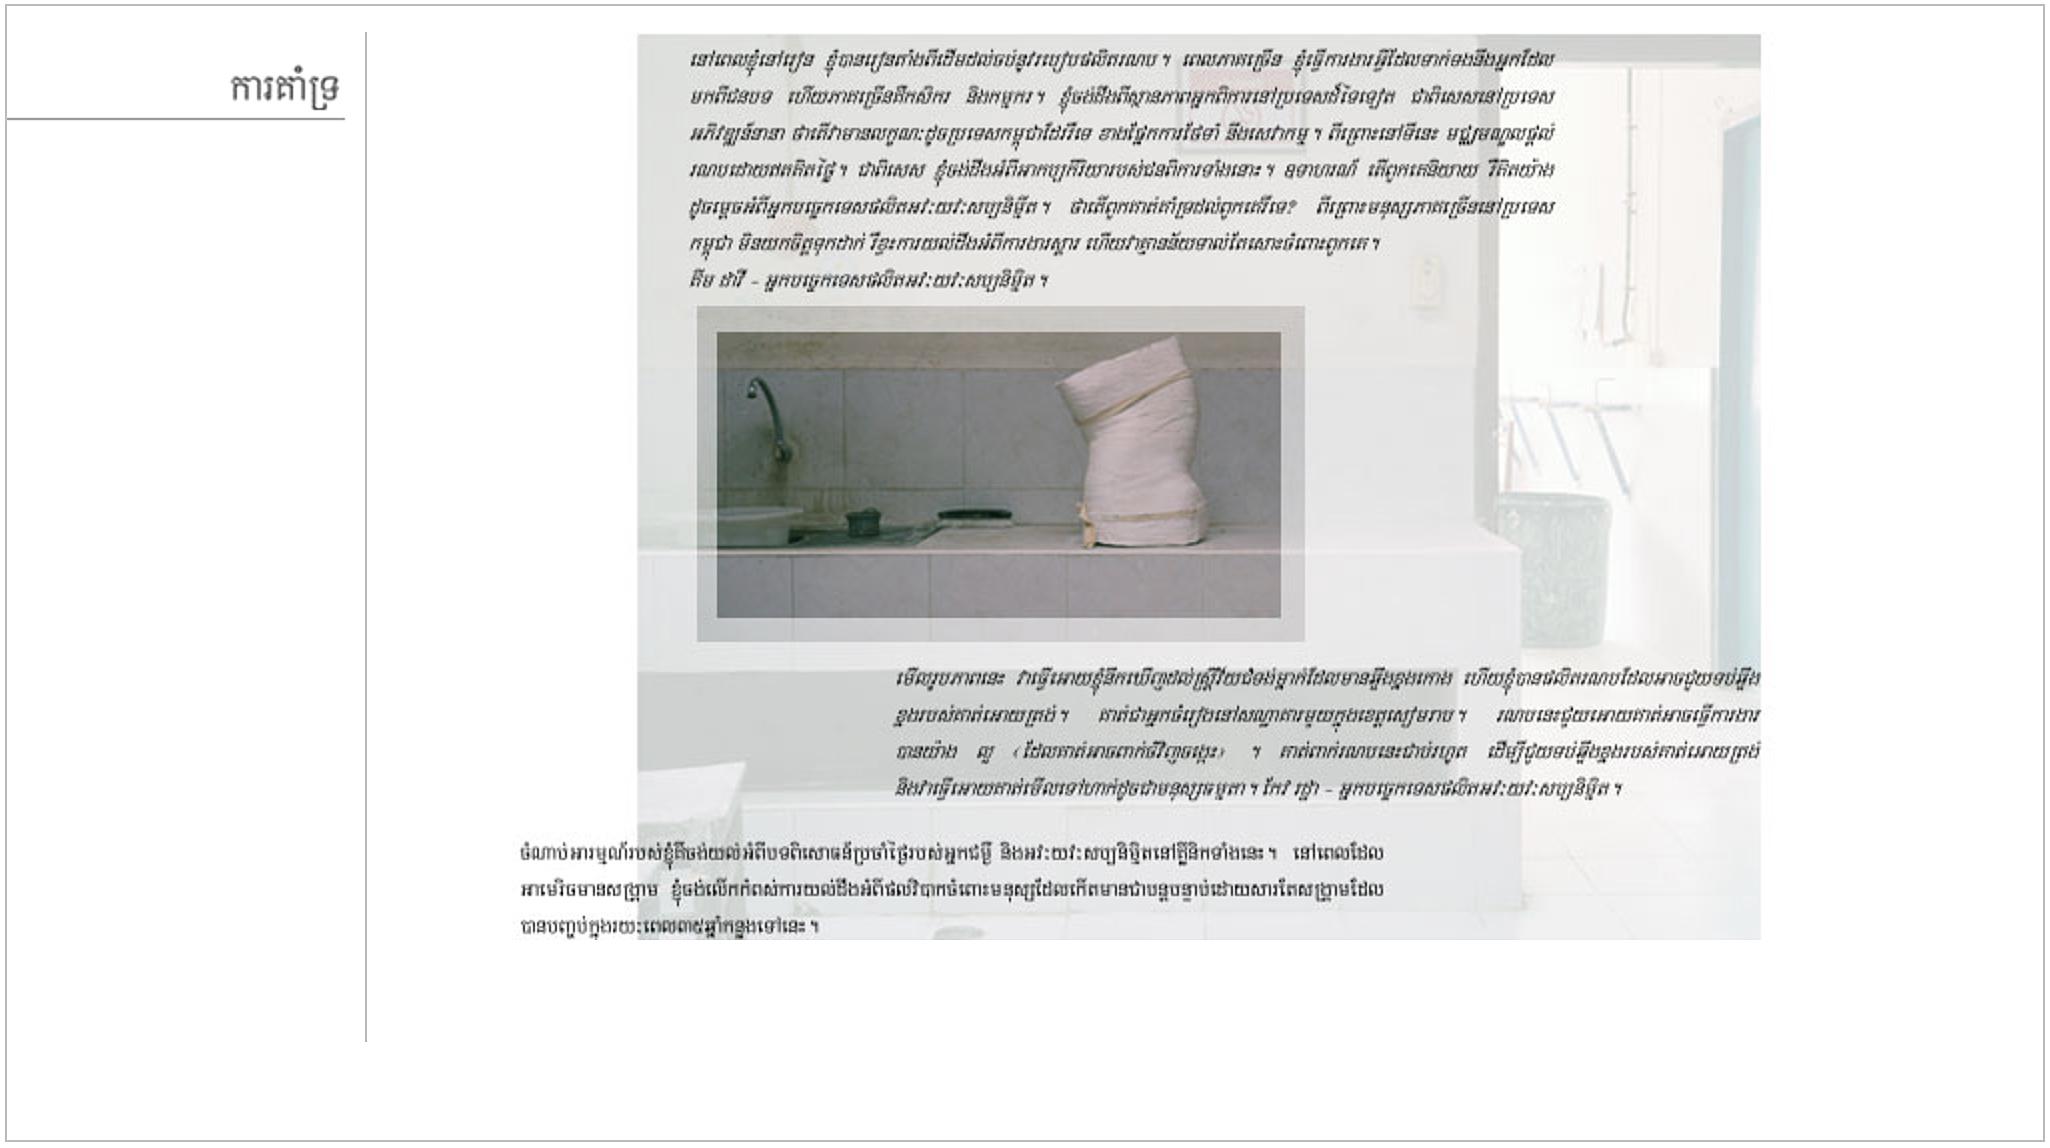 pg 44 copy.jpg